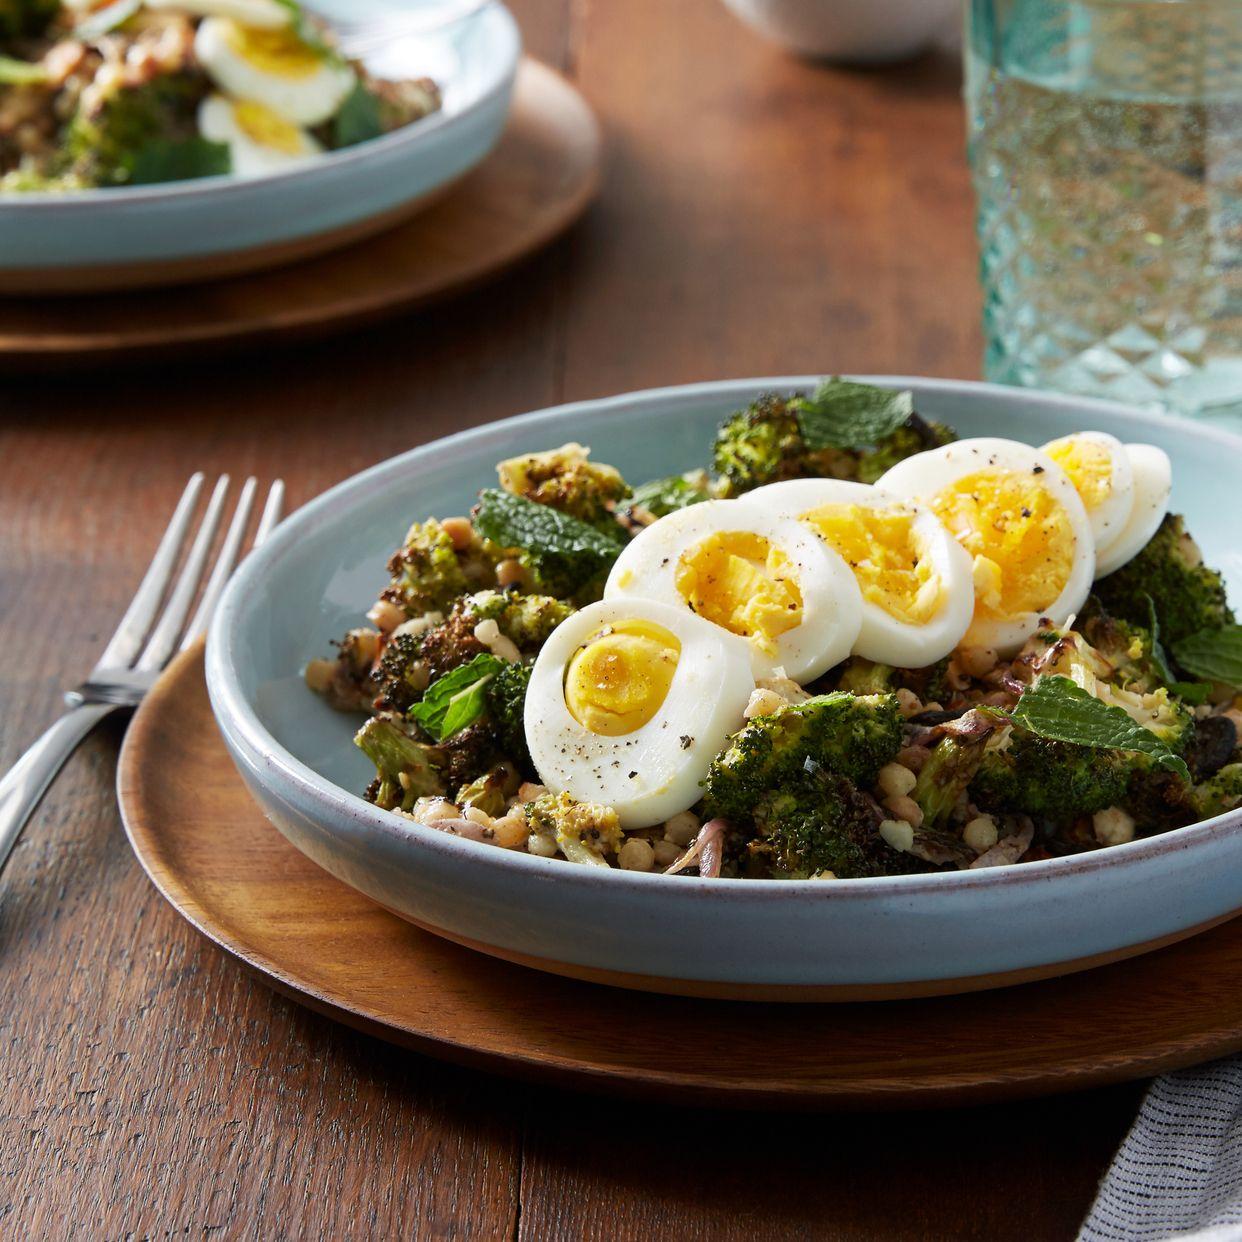 Za'atar-Roasted Broccoli Salad with Fregola Sarda, Pecorino Cheese & Tahini Dressing